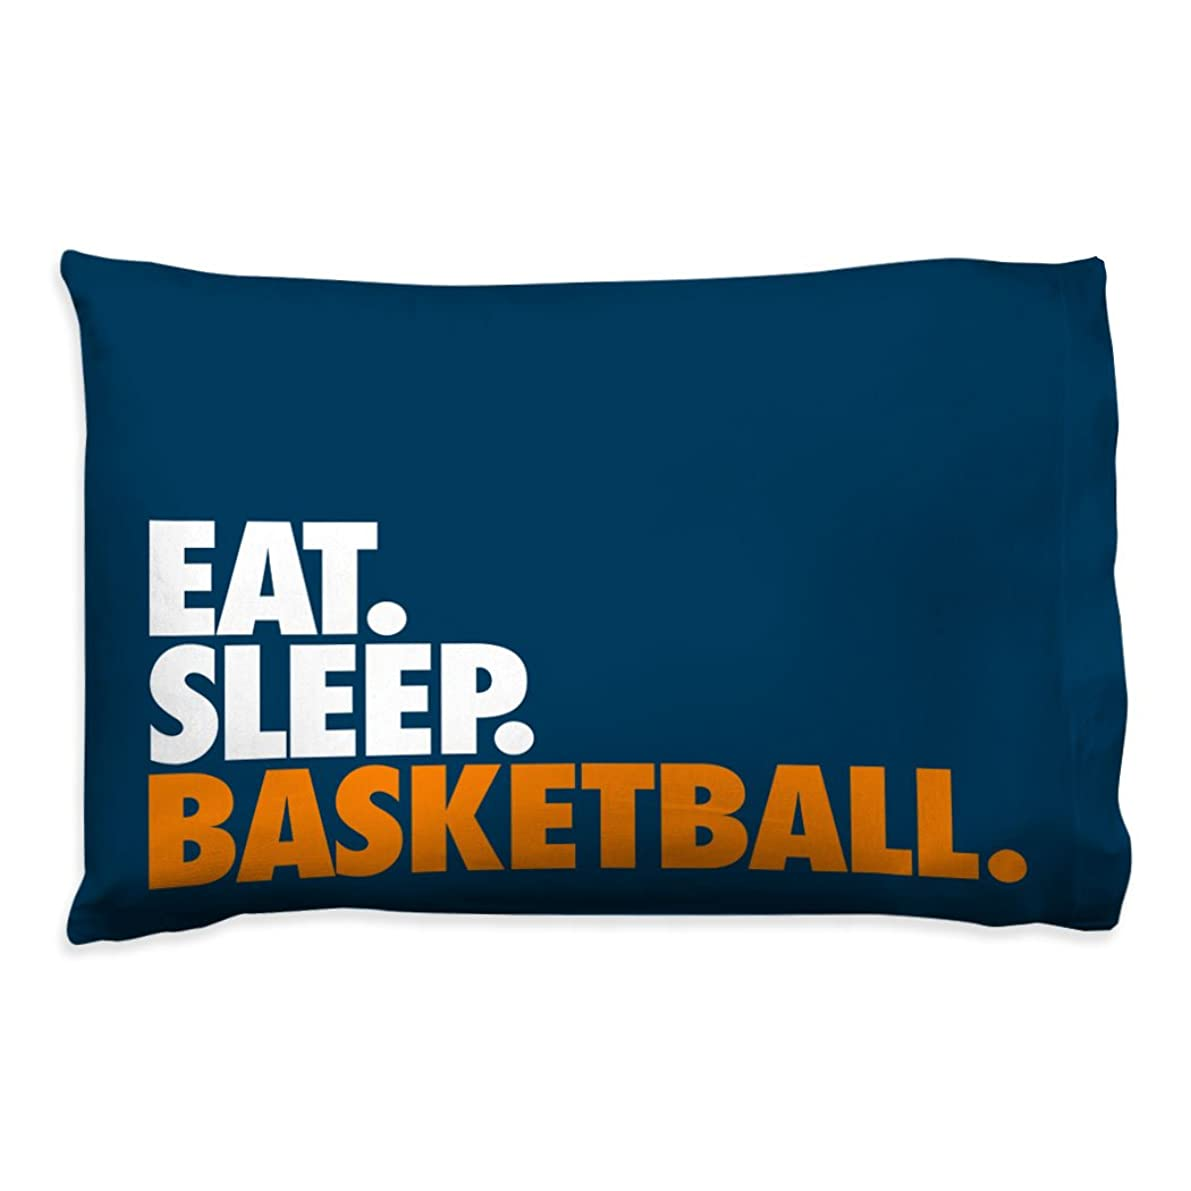 Eat Sleep Basketball Pillowcase | Basketball Pillows by ChalkTalk Sports | Navy